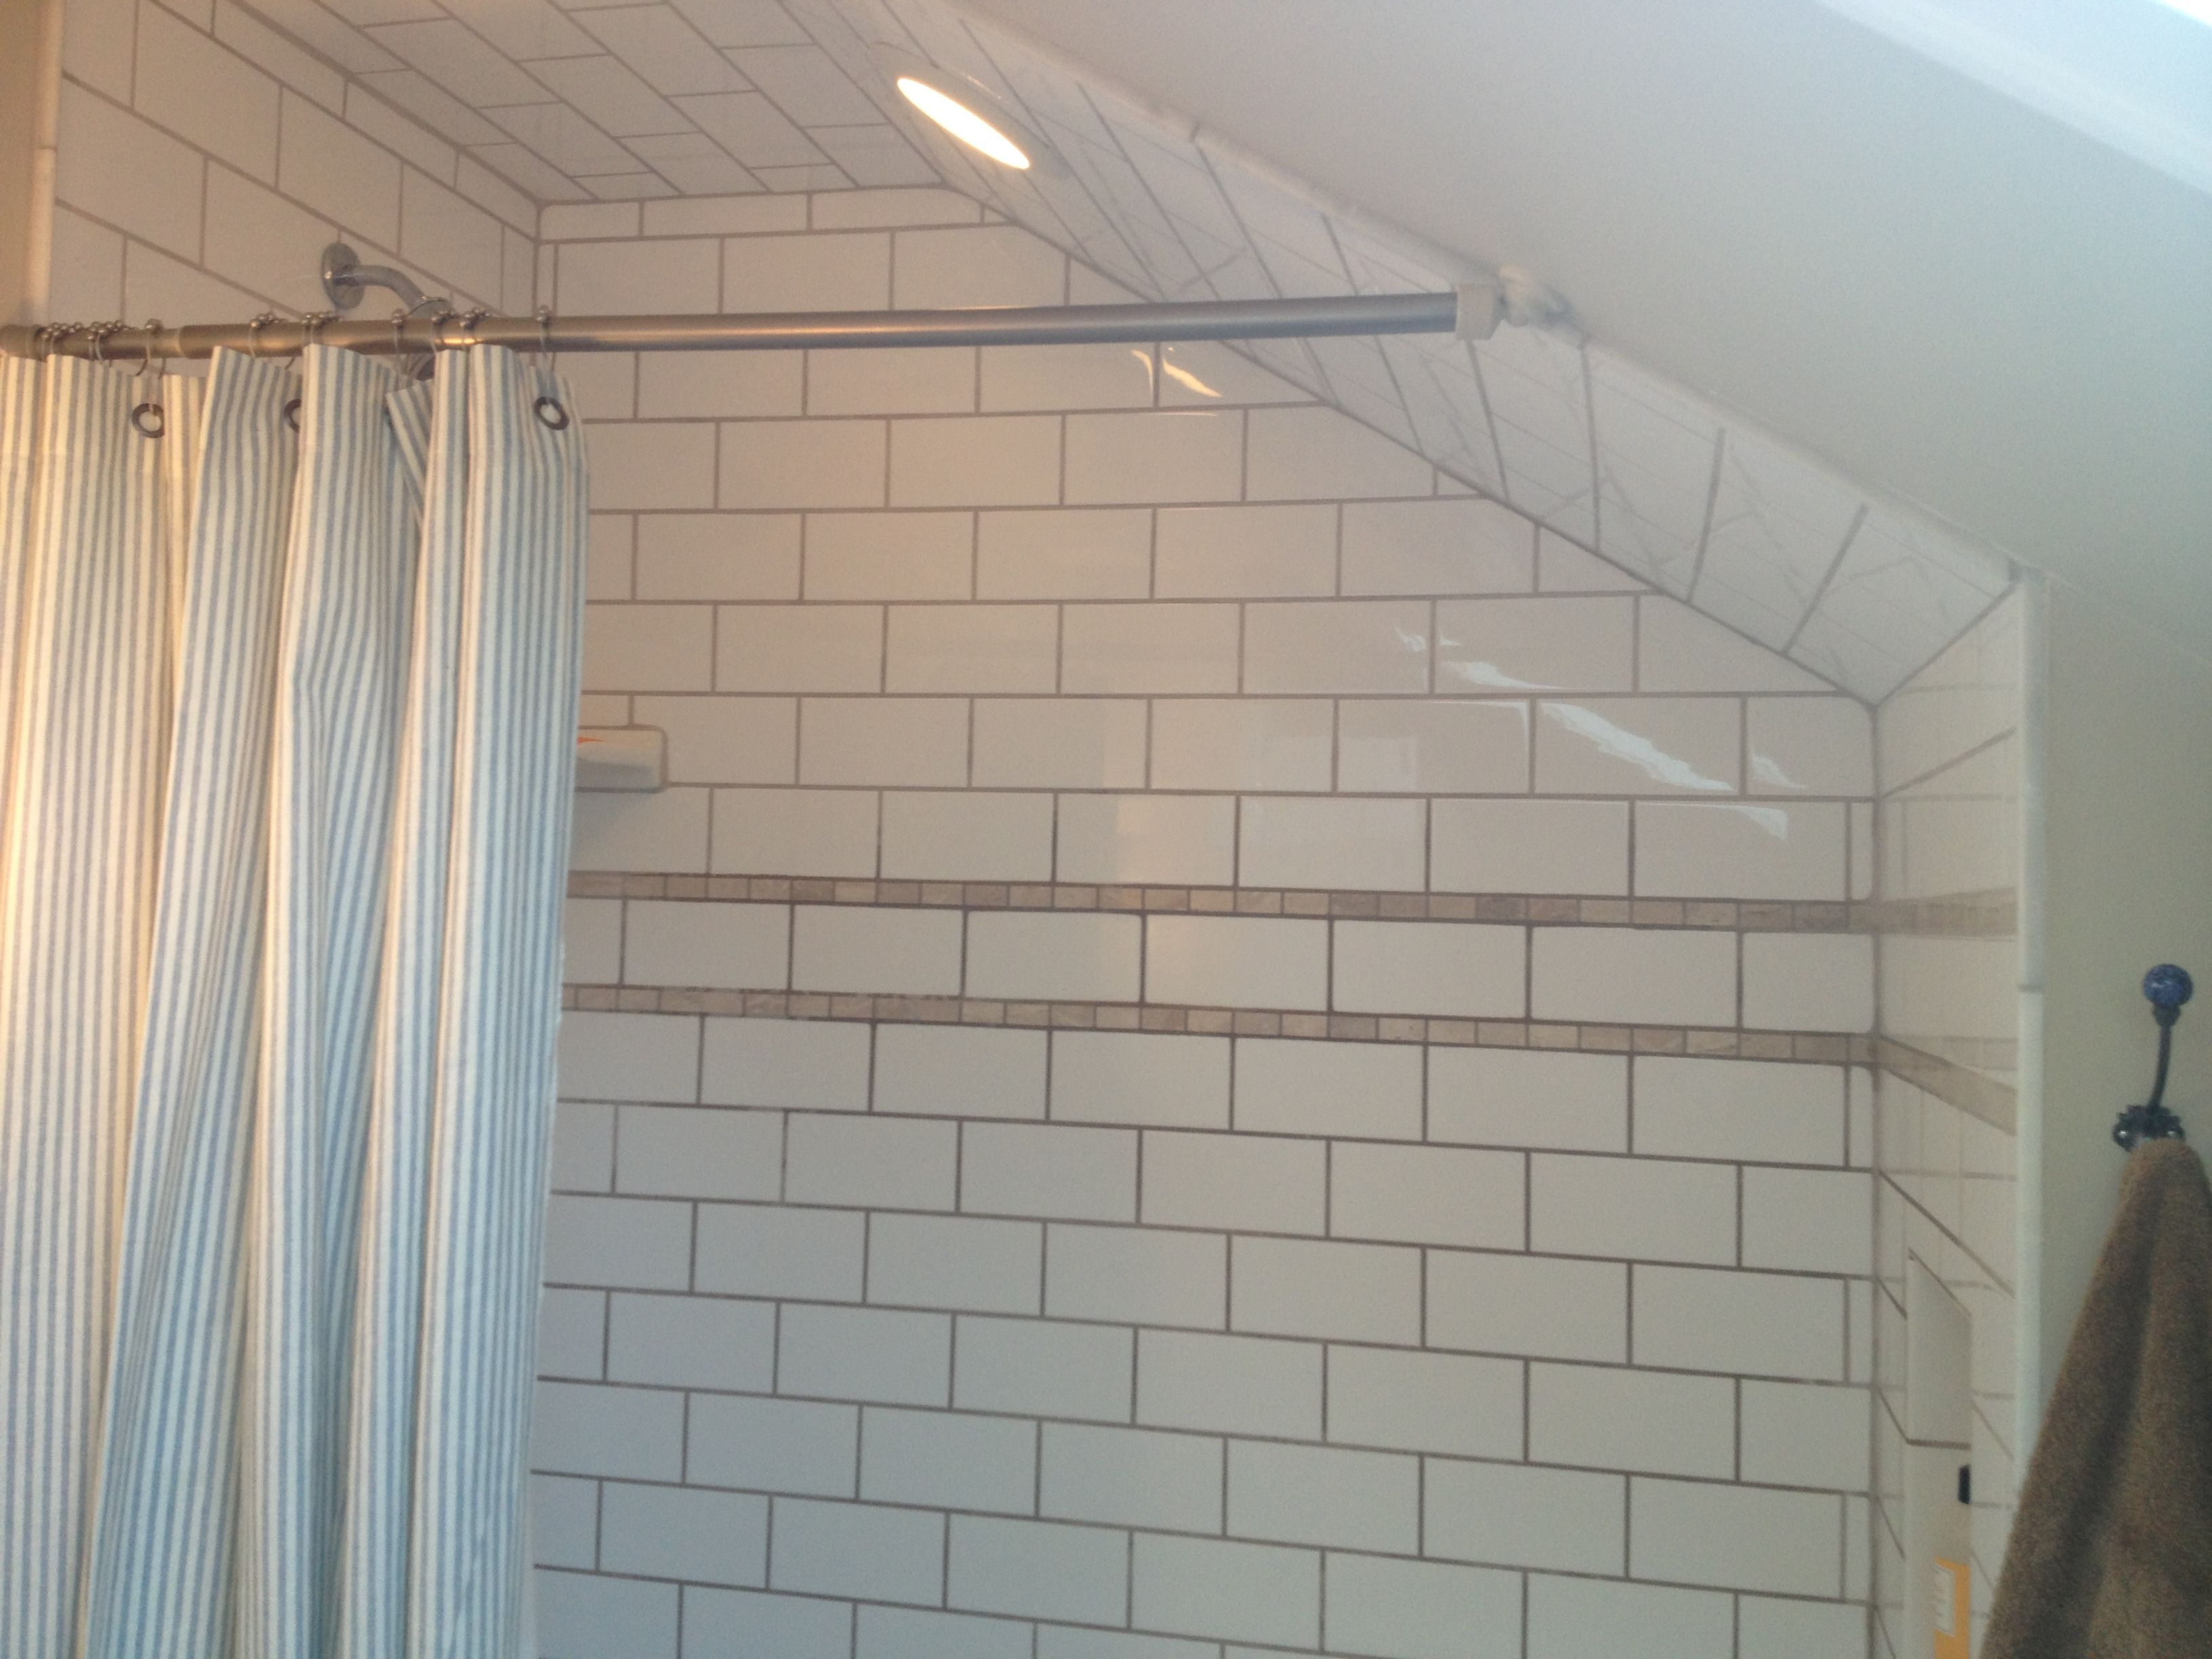 Attic bathroom slanted ceiling decor pinterest for Small bathroom with sloped ceiling